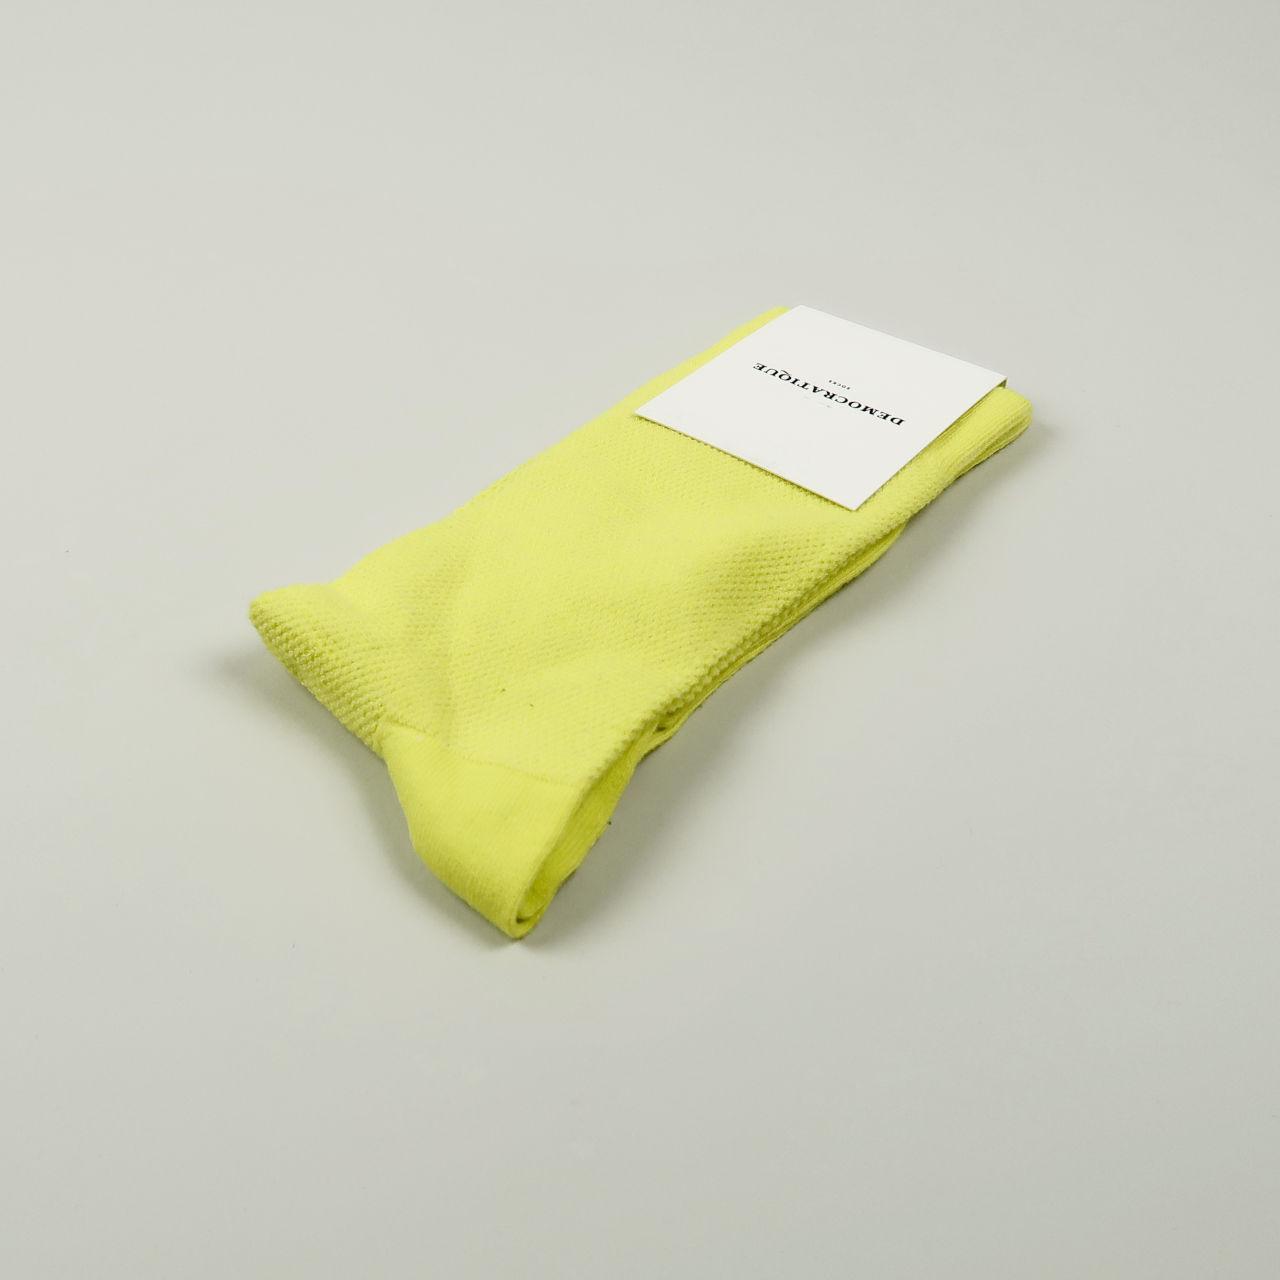 Women's Socks - Champagne Pique - Bright Yellow